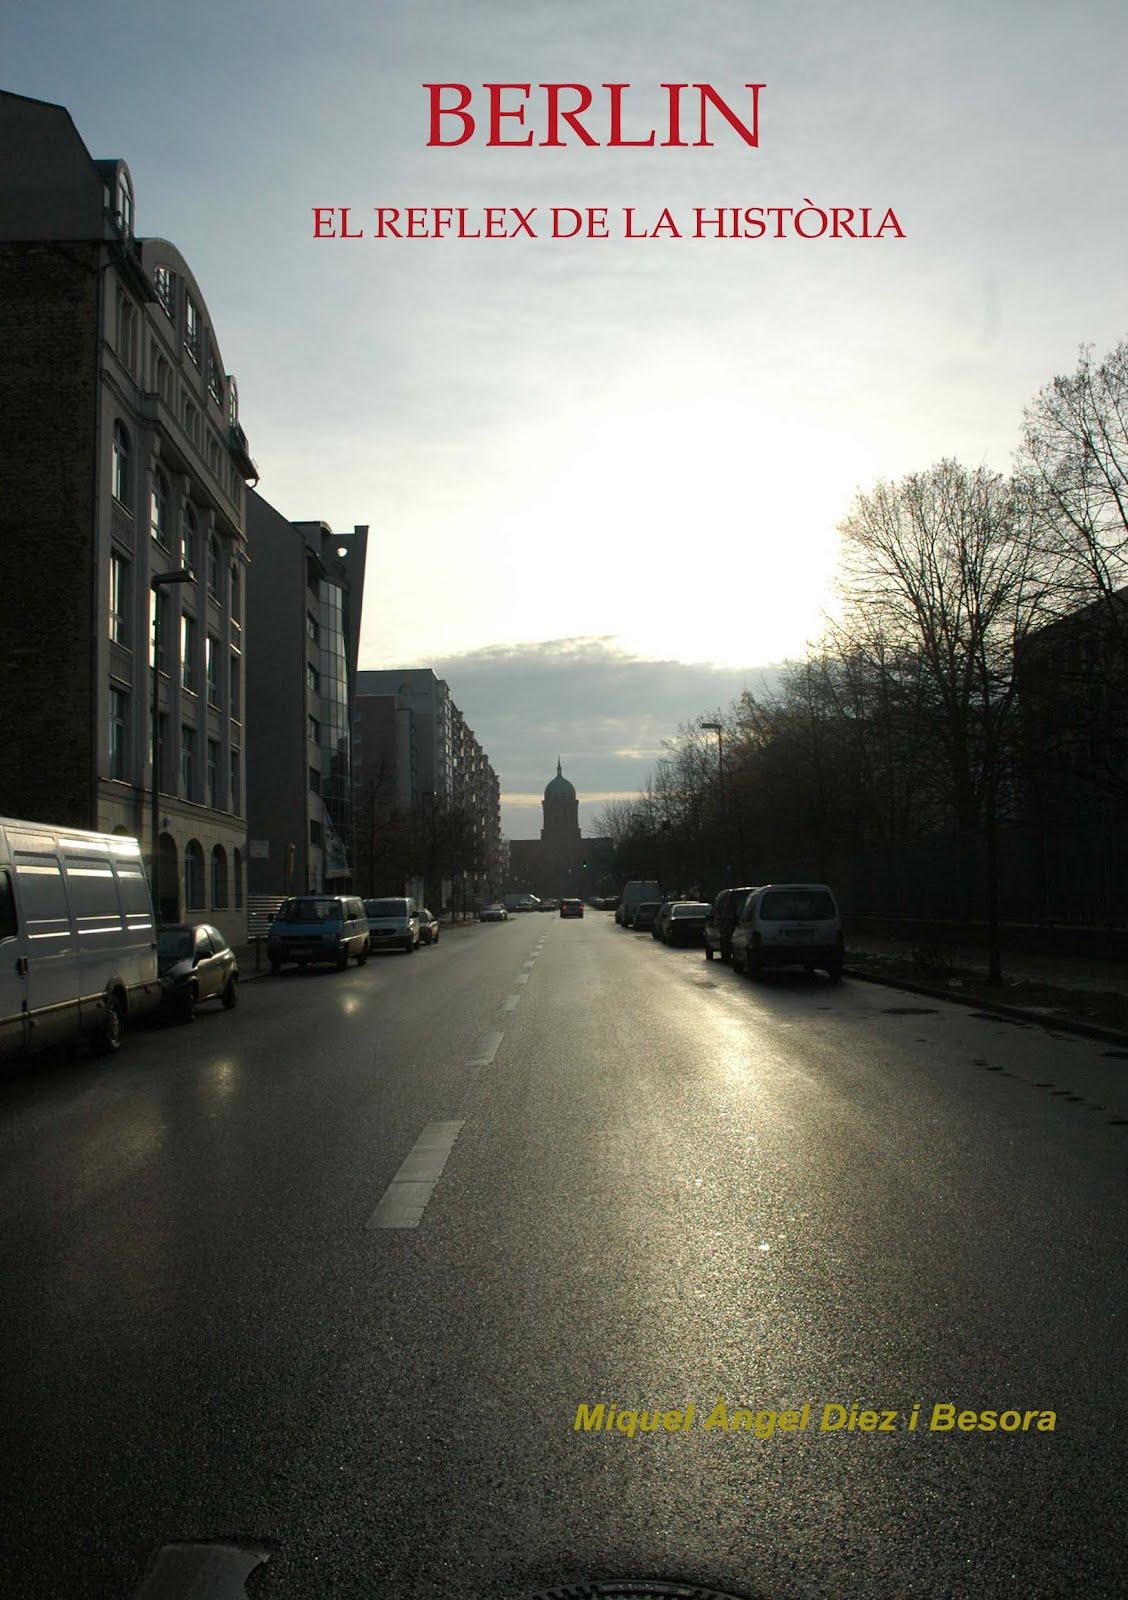 Berlinelreflexdelahistoria